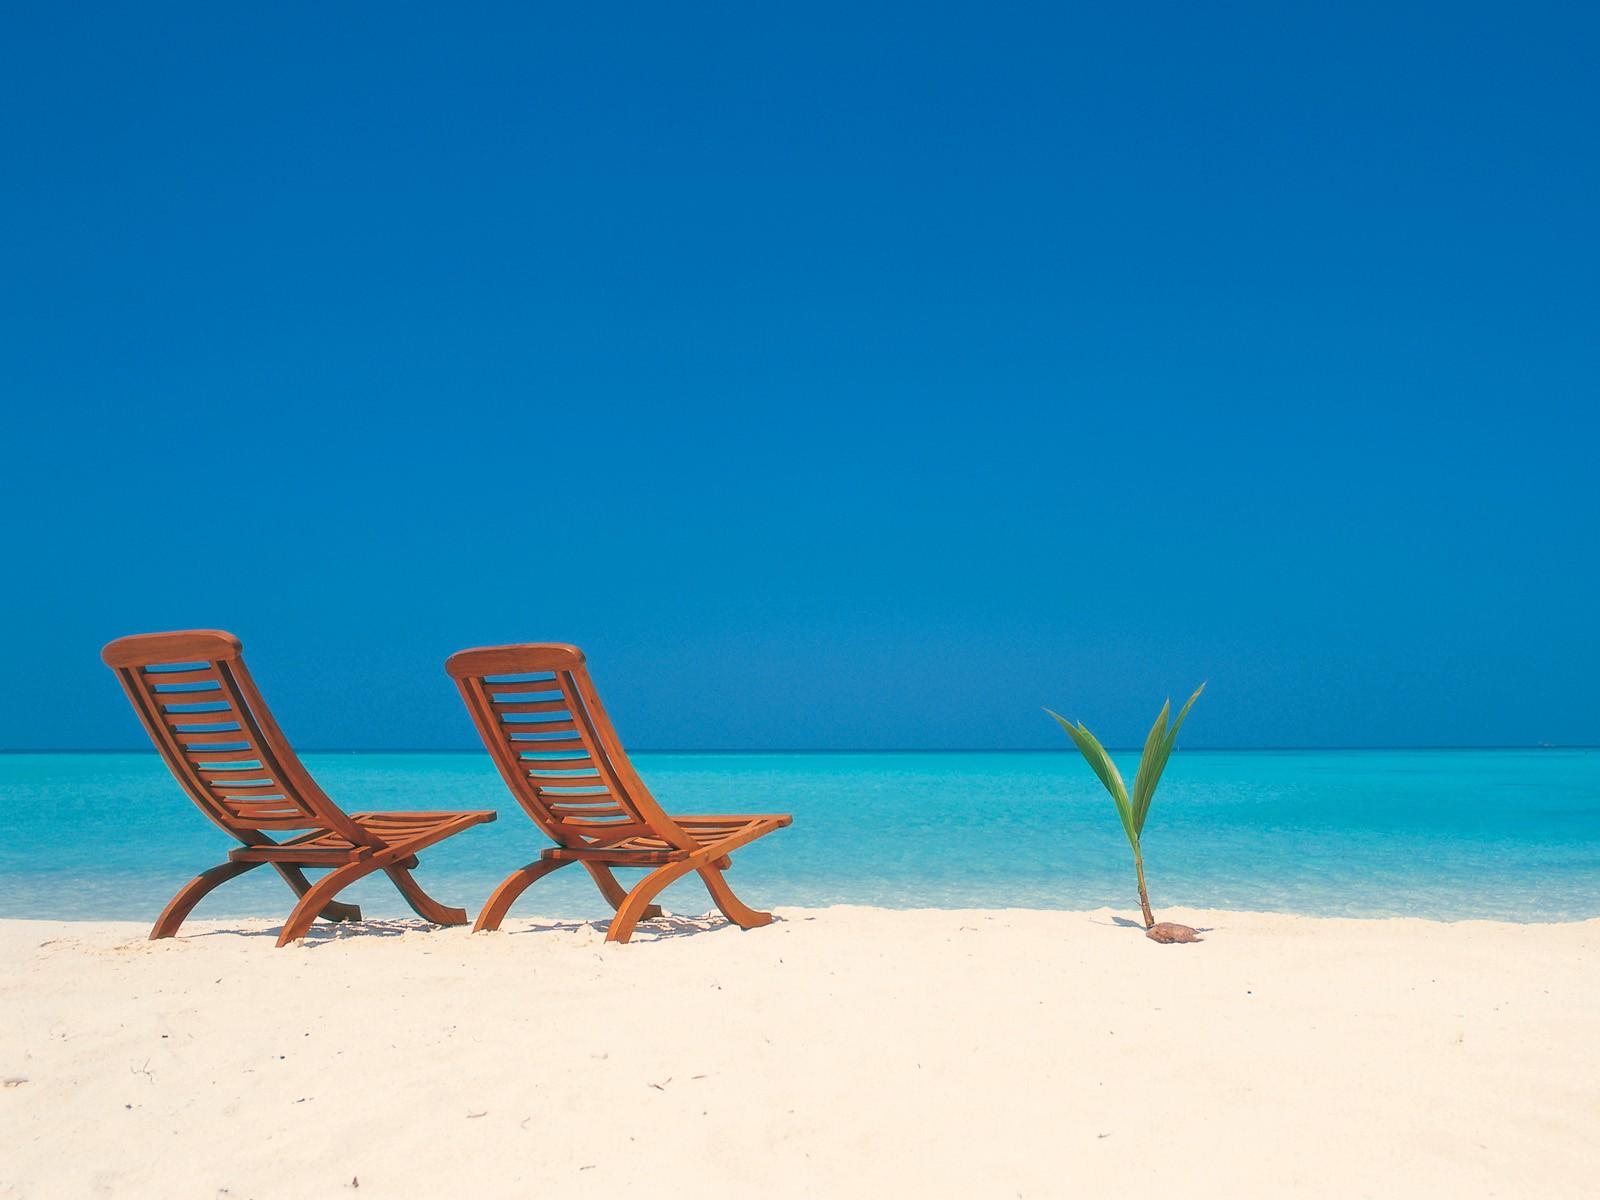 Nature Beach Chairs Wallpaper